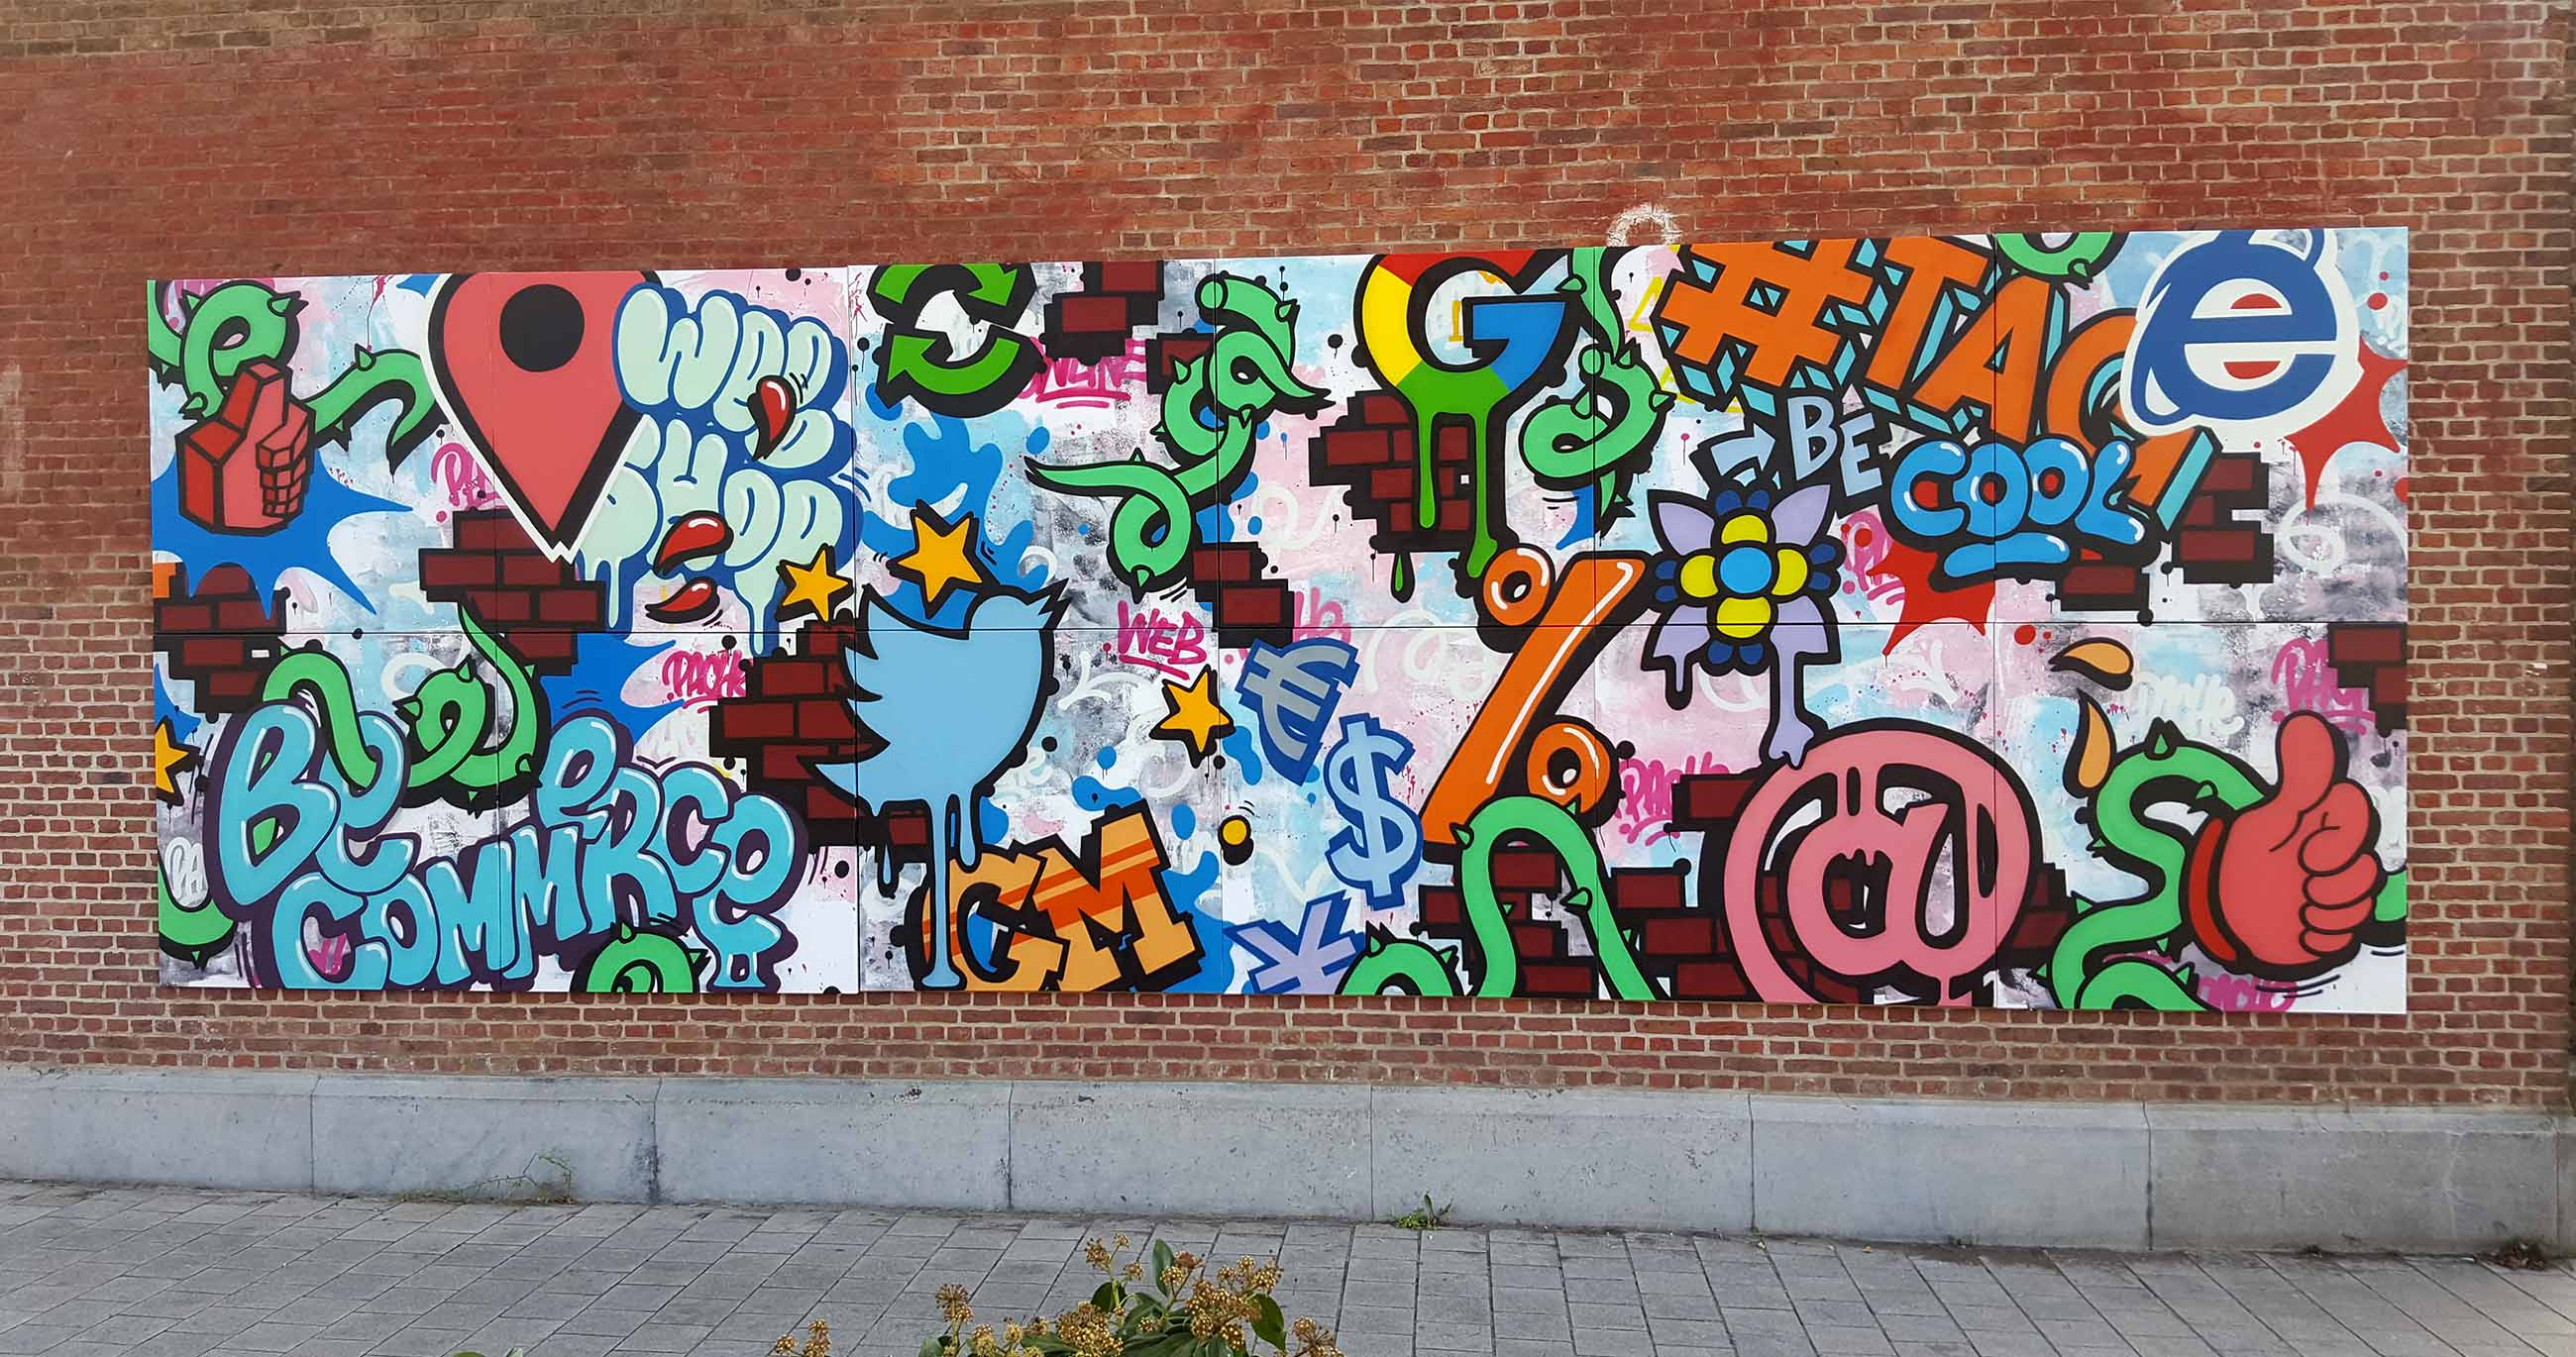 https://www.propaganza.be/wp-content/uploads/2019/04/pache-graffiti-pop-propaganza-urban-artist-6.jpg